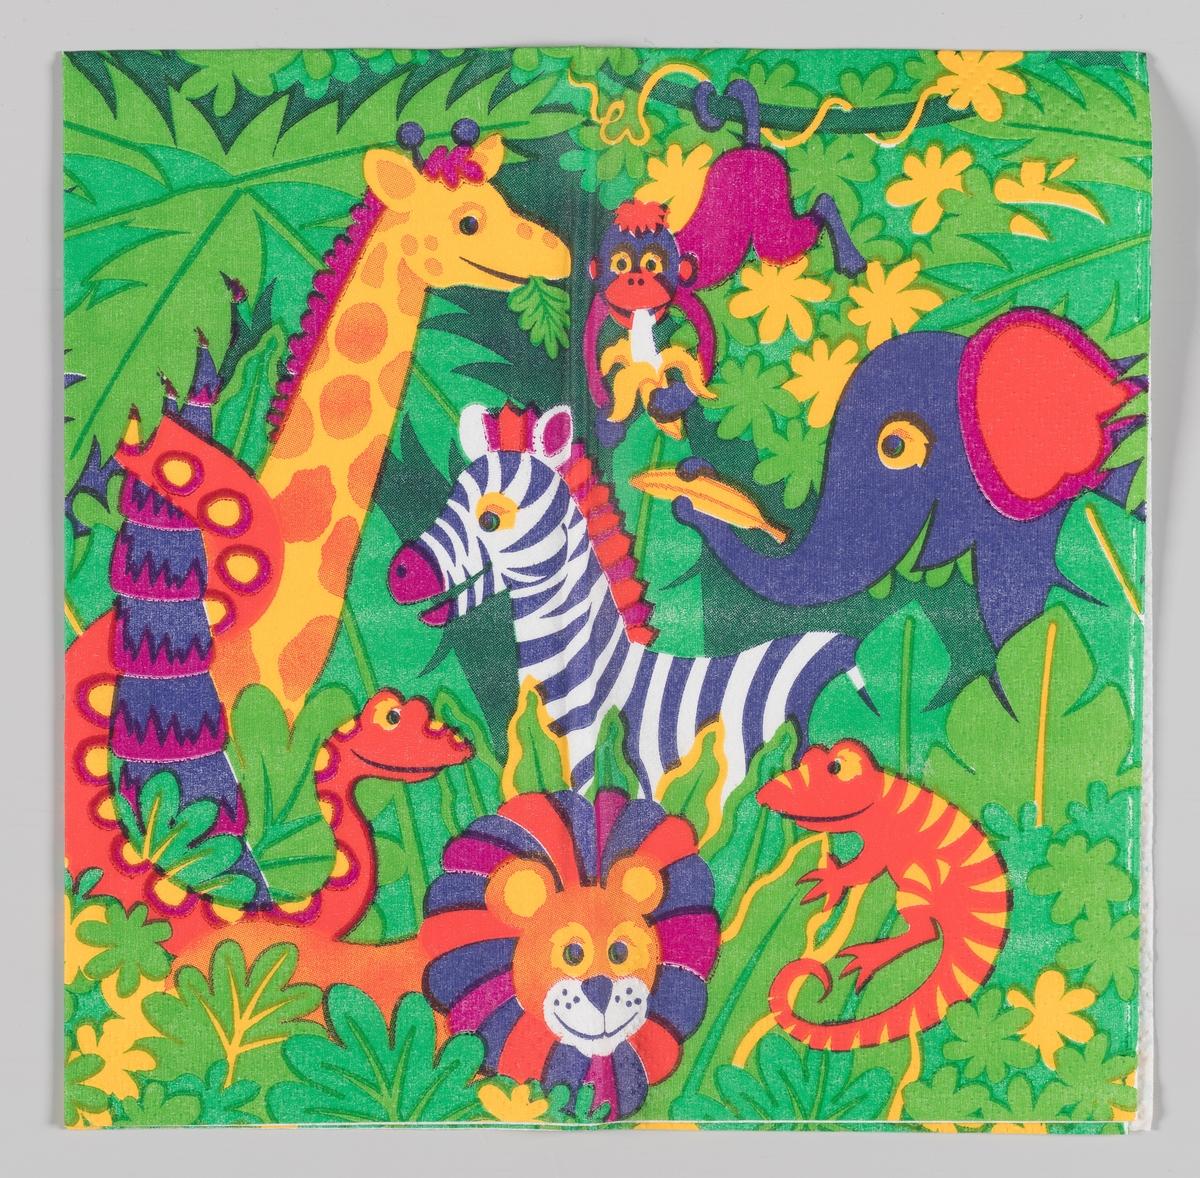 Afrikanske dyr i en jungel: En giraff, en ape, en elefant, en sebra, en slange en løve og en øgle